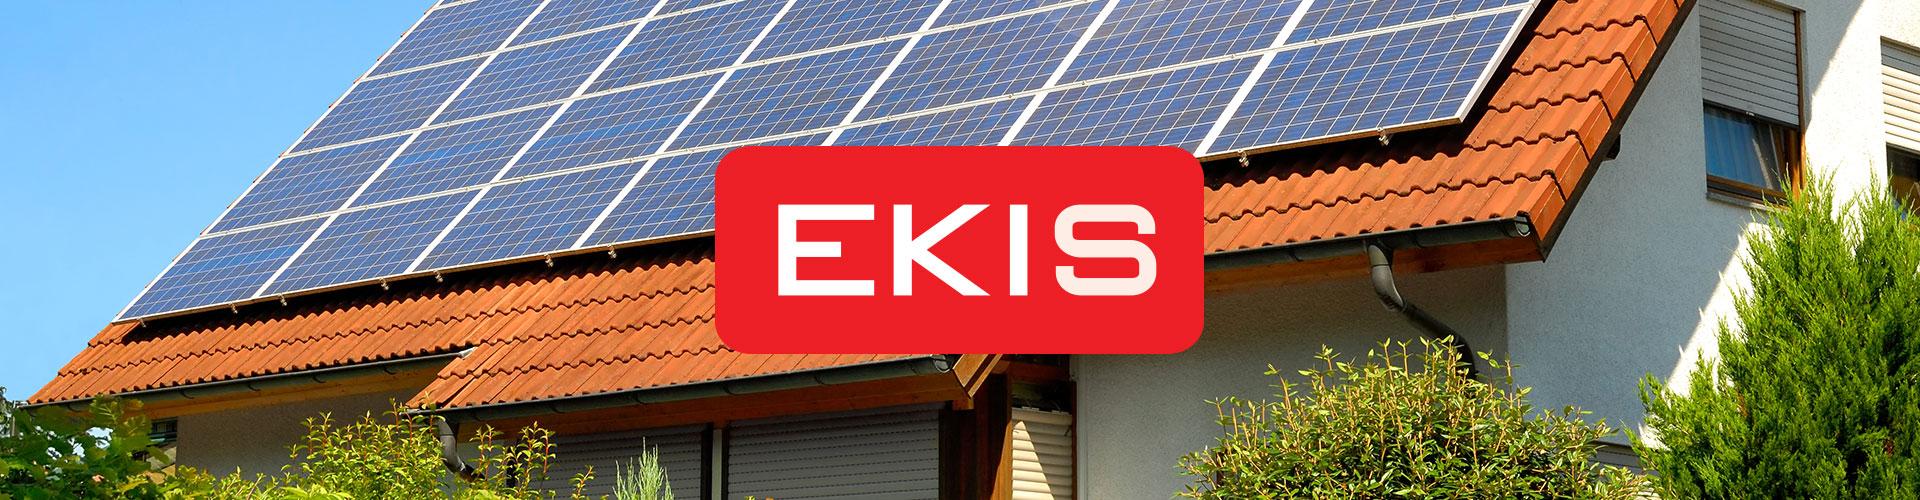 EKIS-Fons